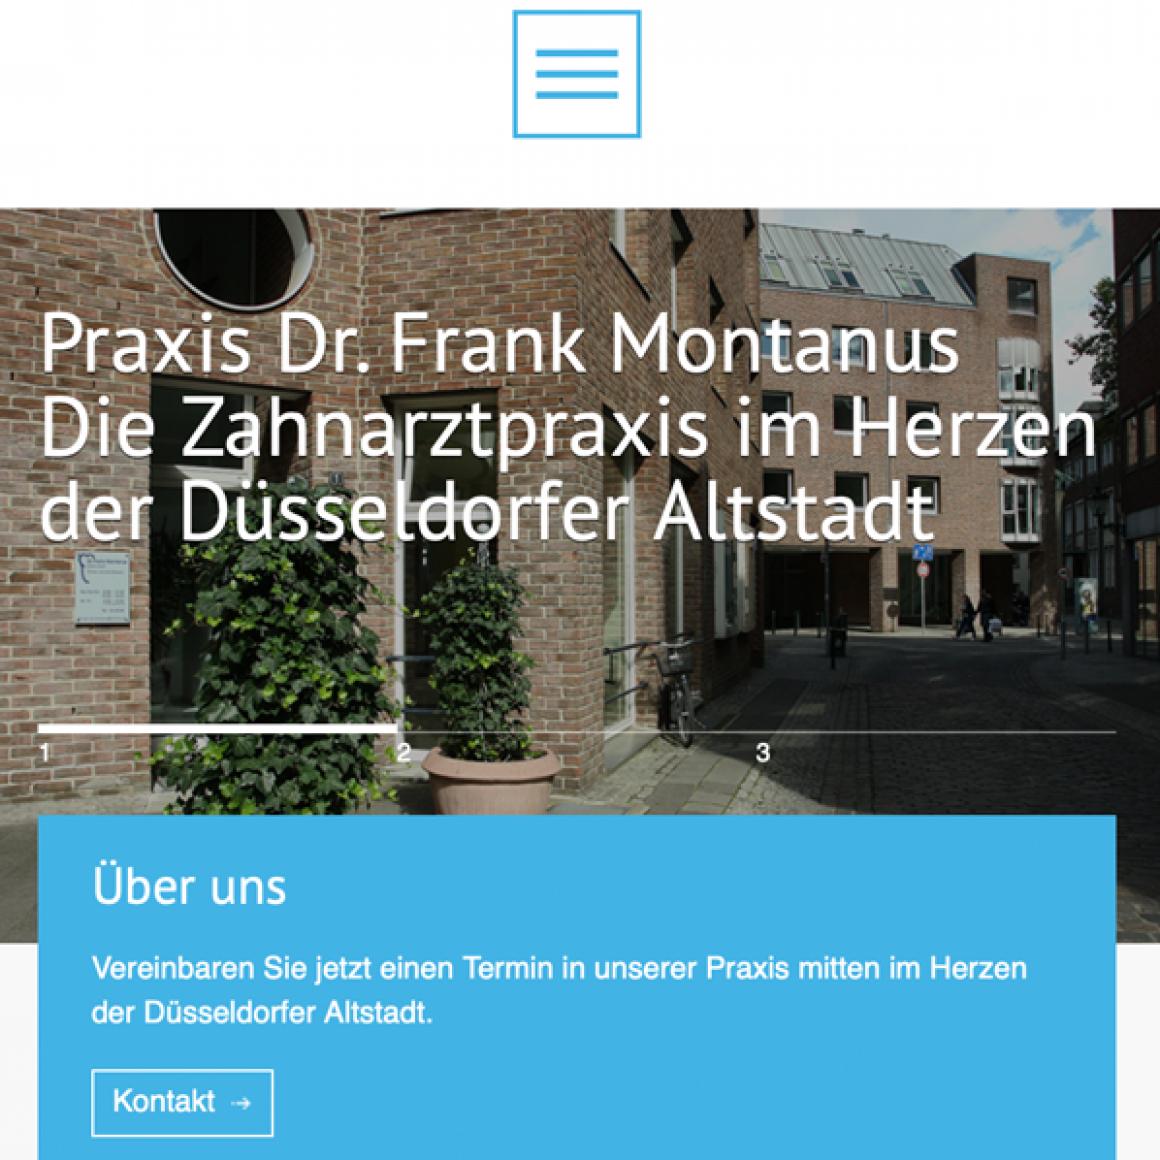 FM_Referenz_Main_Mobile-1160x1160 Dr. Montanus